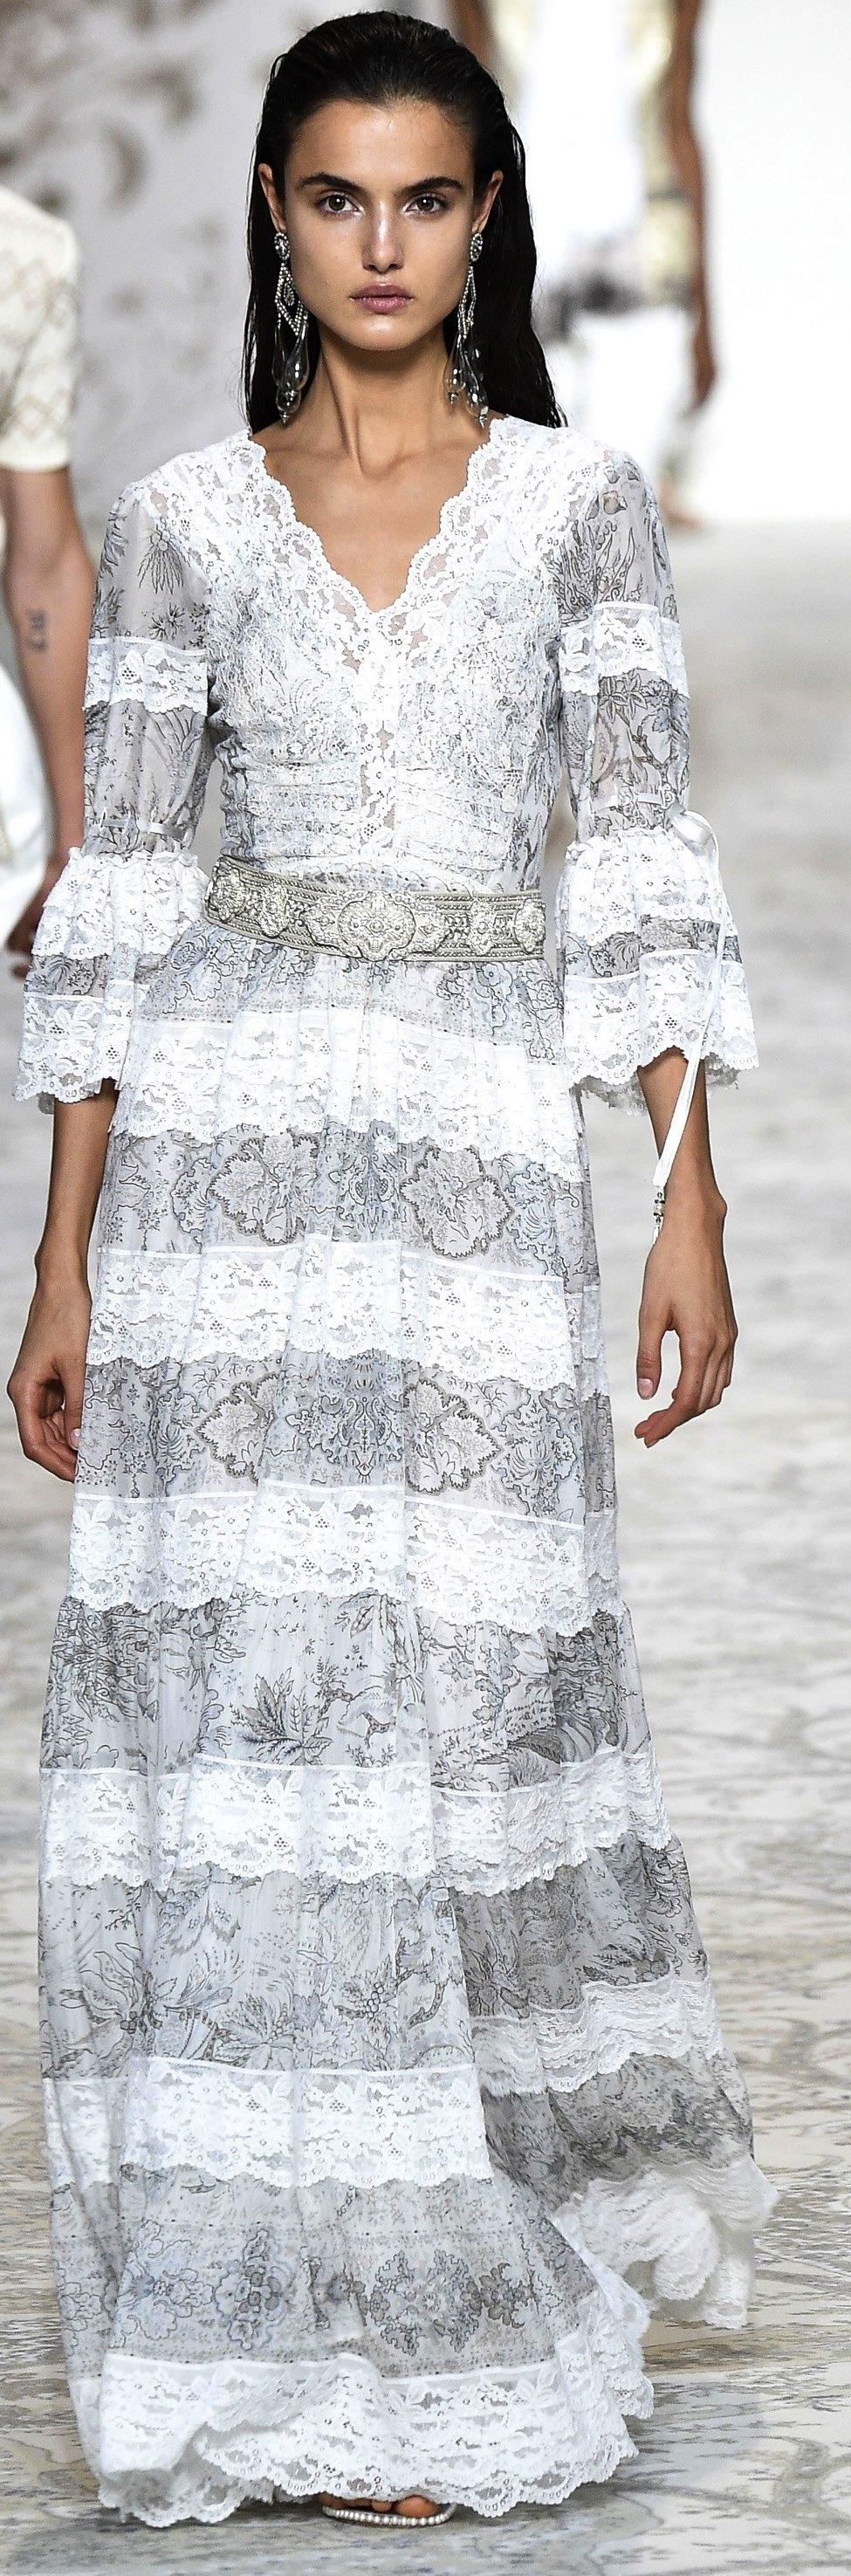 ETRO RTW SS 2018 | Moda ...pasarelas y mas ..... | Pinterest ...